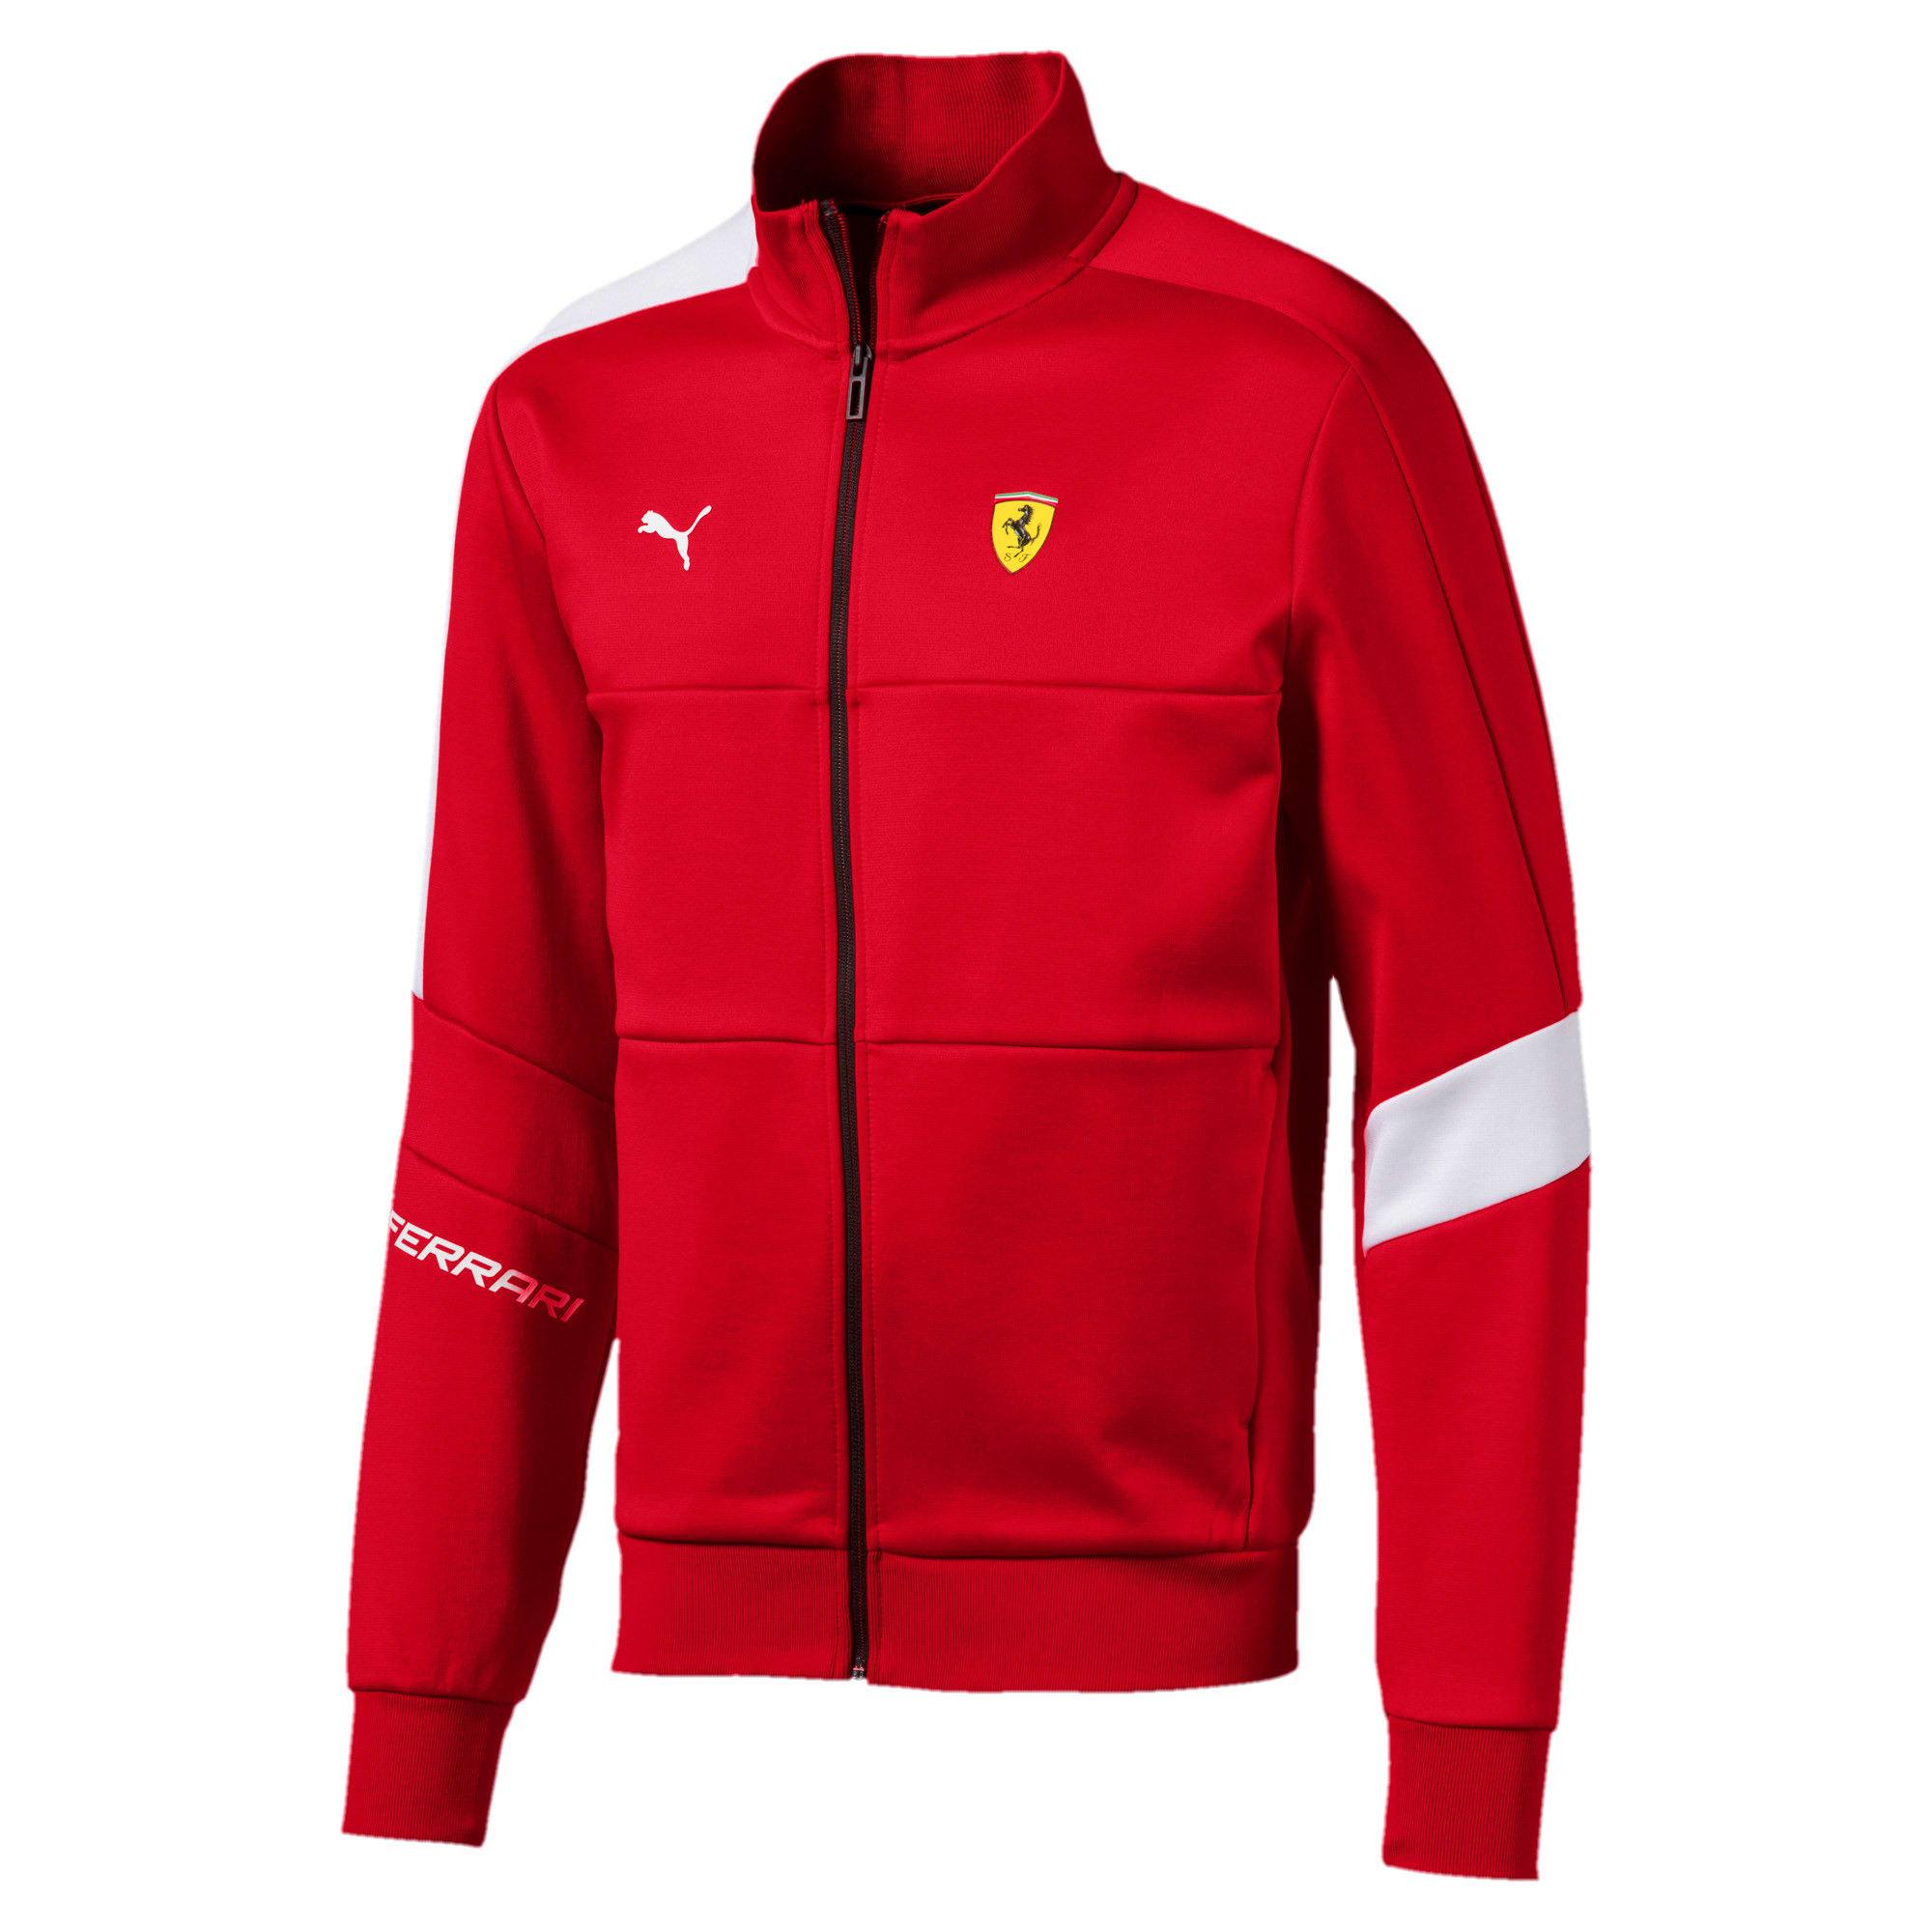 Thumbnail 4 of Ferrari T7 Herren Trainingsjacke, Rosso Corsa, medium